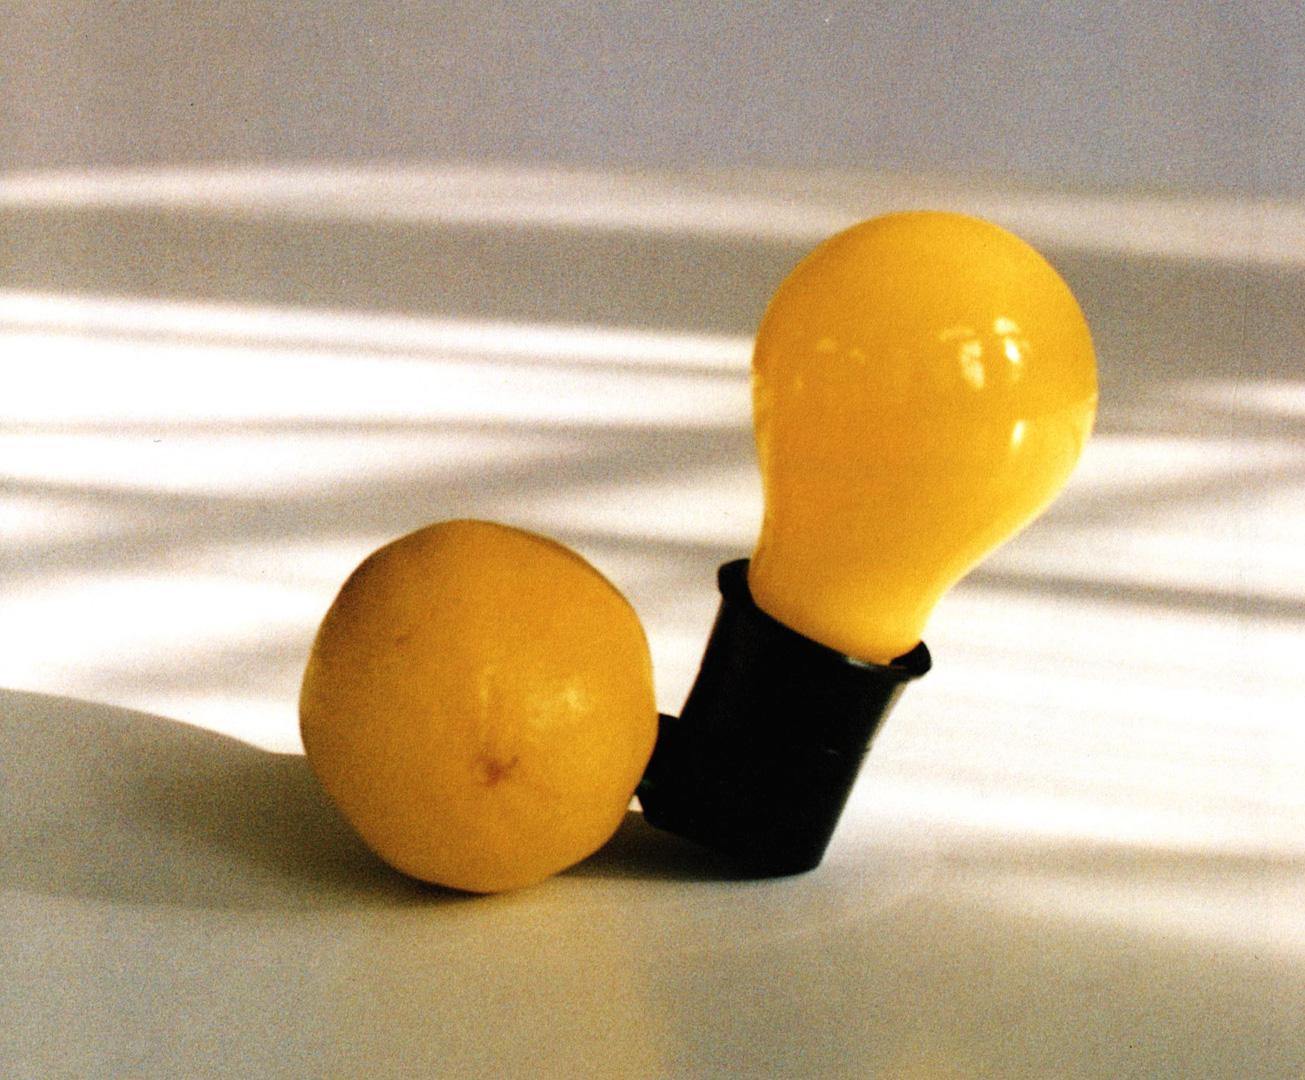 "/""Capri-Batterie/"" JOSEPH BEUYS 1985  Kunst-Postkarte"